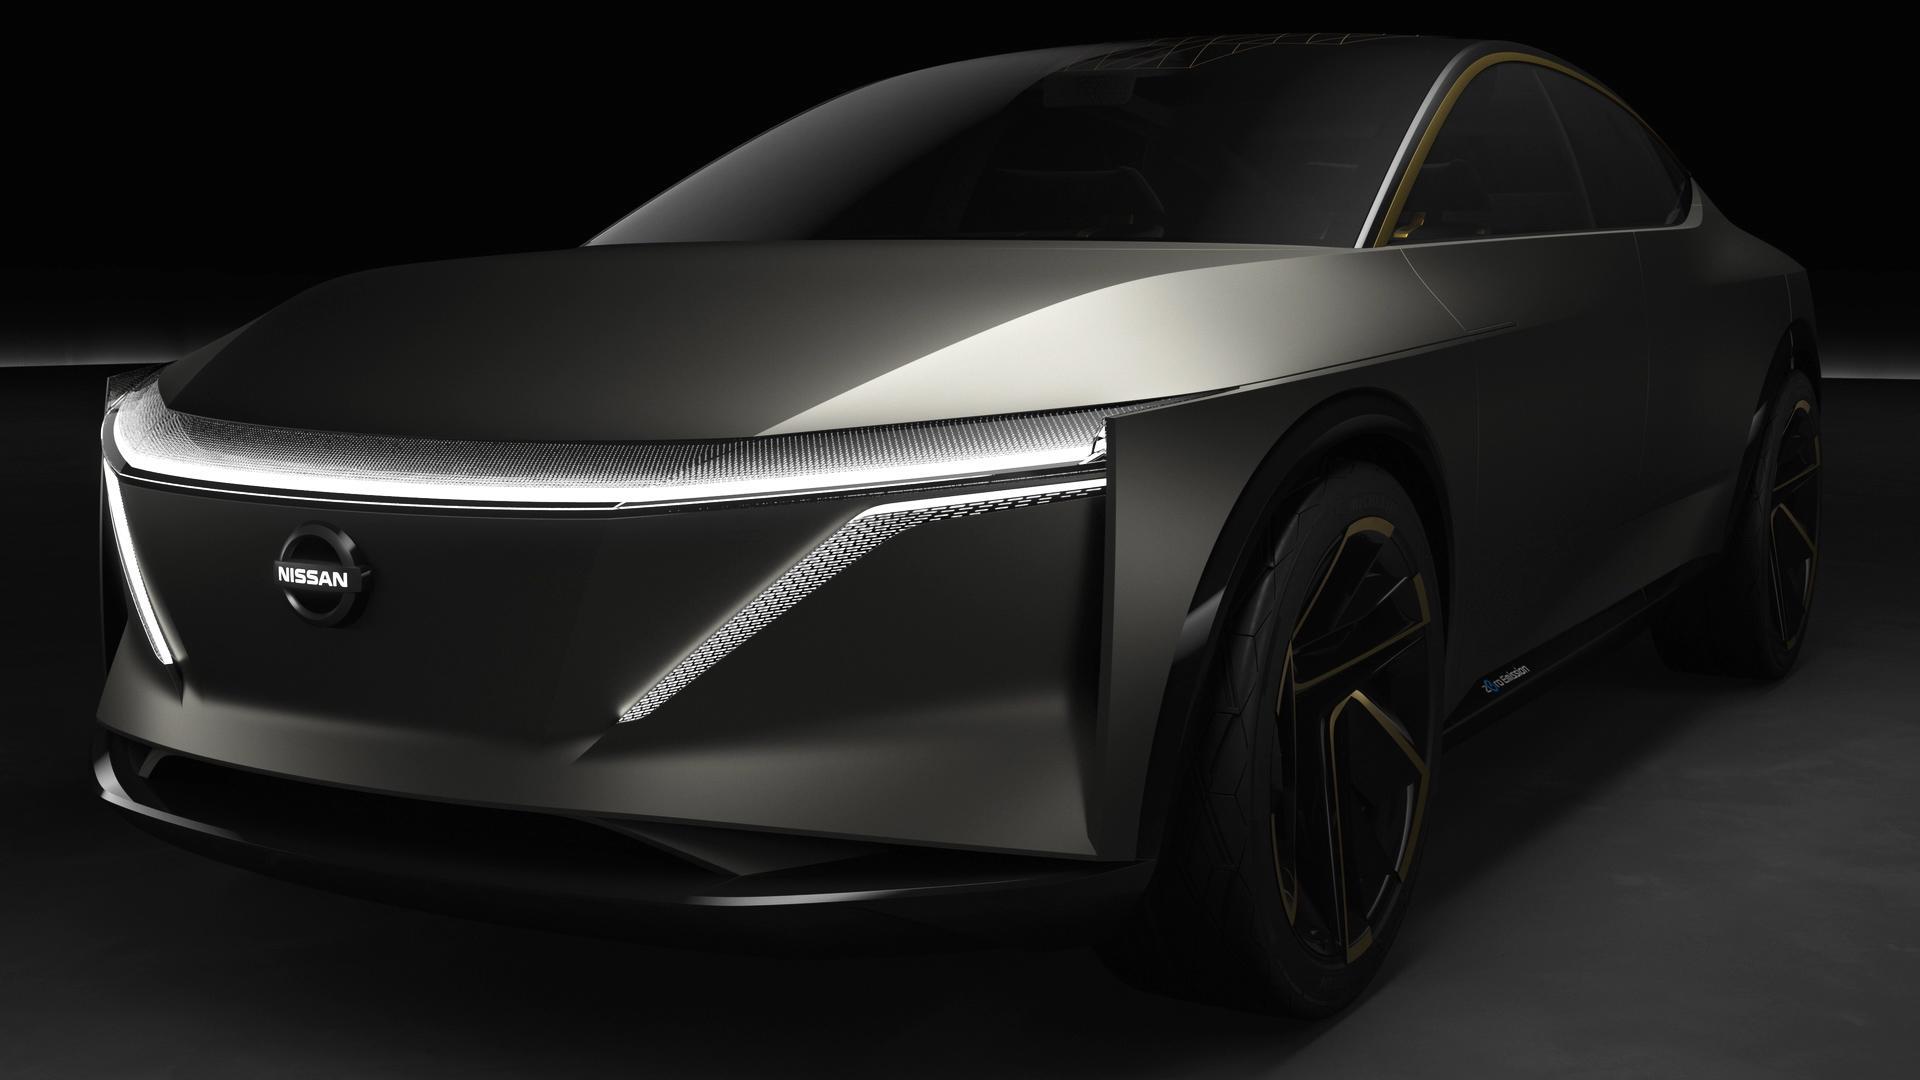 Nissan Announces Layoffs In Mississippi | Autoblog for Canton Trade Days Schedule 2022